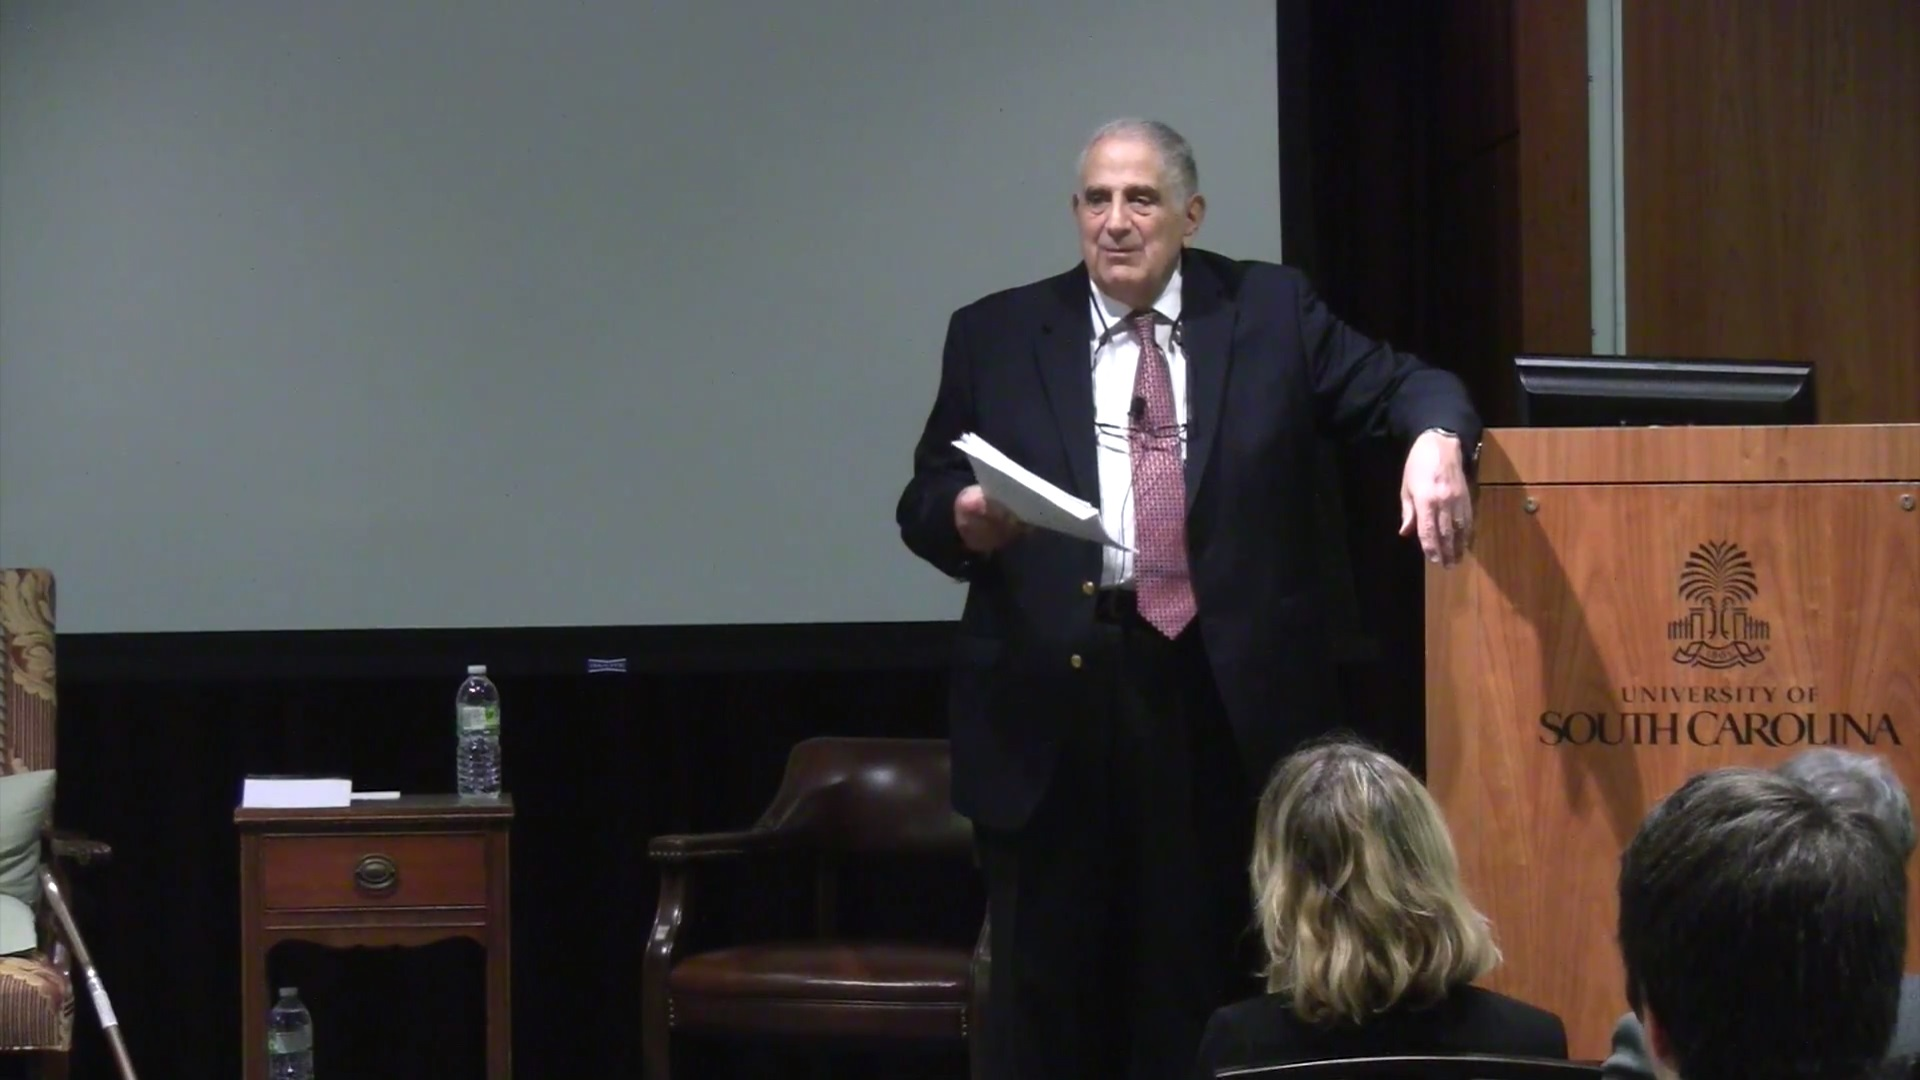 Jack Shaheen: A Reel Important Scholar